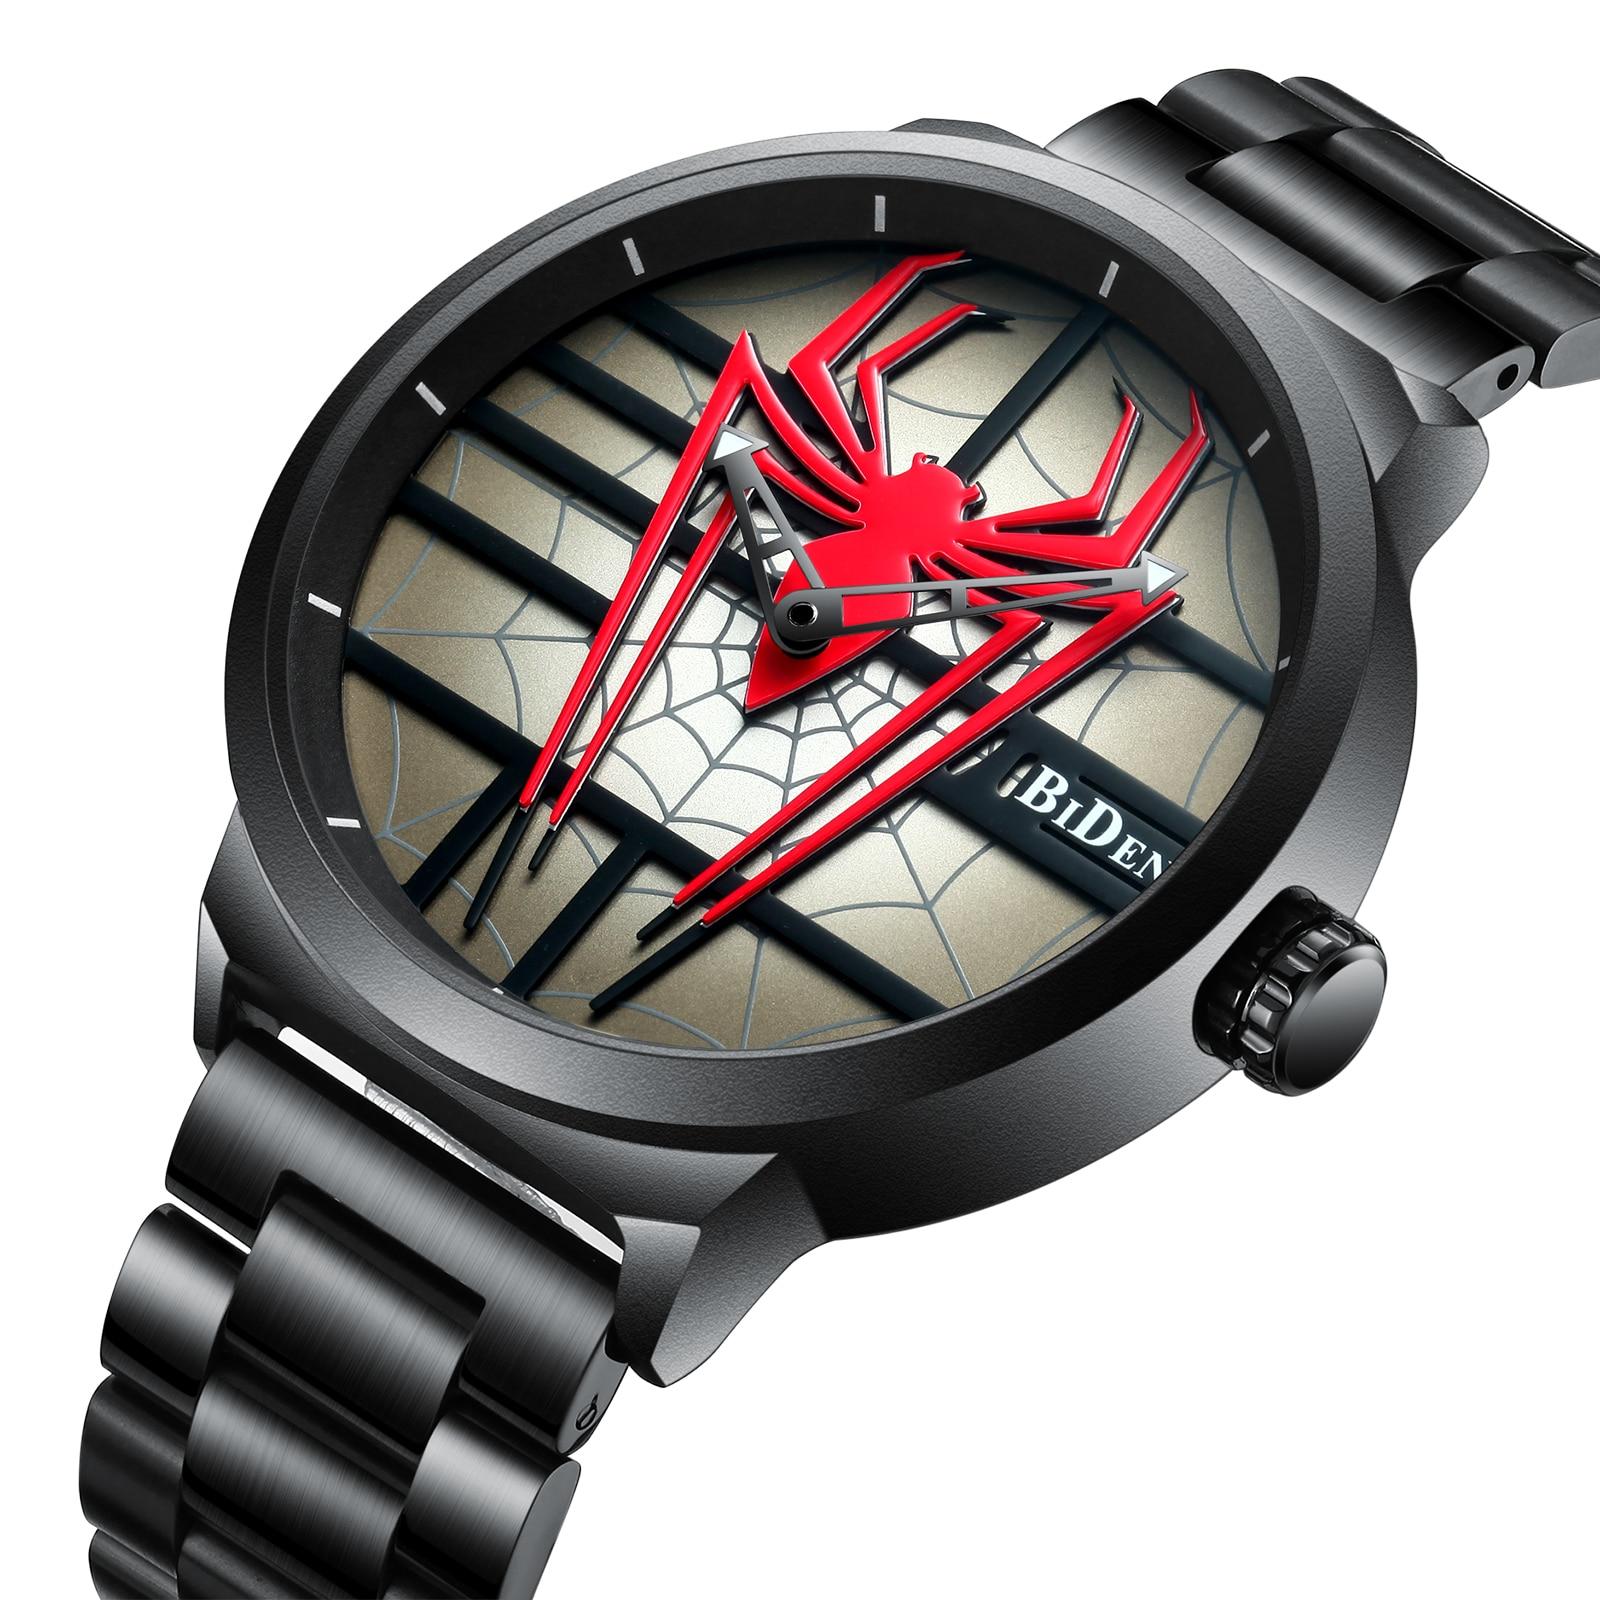 BIDEN Fashion Men Watch 2019 Waterproof Black Stainless Steel Band Unique Spider Dial Male Quartz Sports Wristwatch Casual Clock